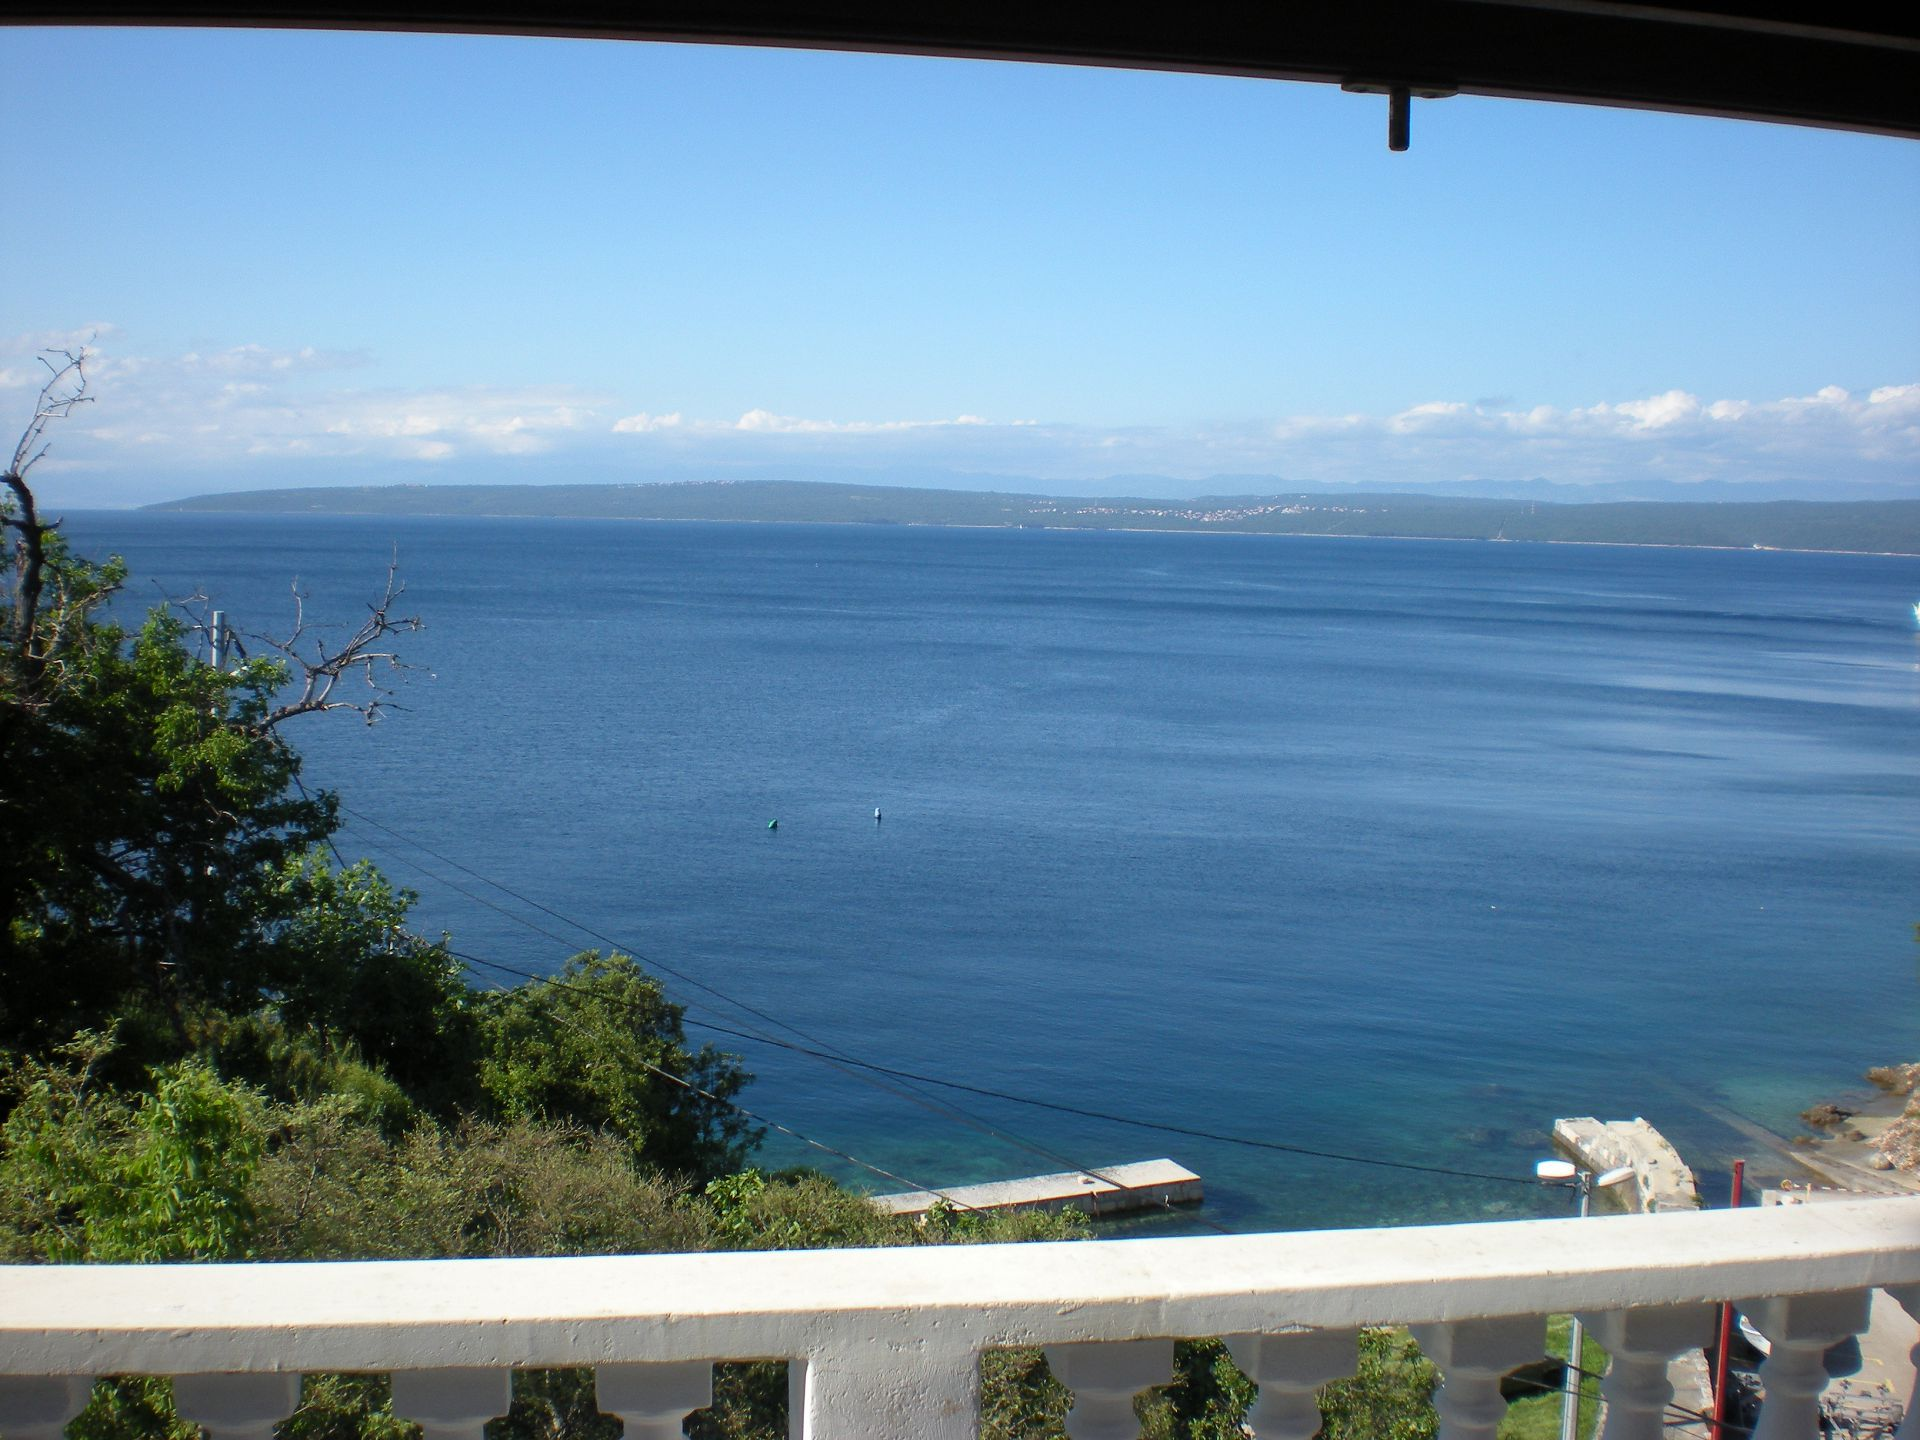 Appartement de vacances BT A2(4) - Merag (769321), Merag, Île de Cres, Kvarner, Croatie, image 1